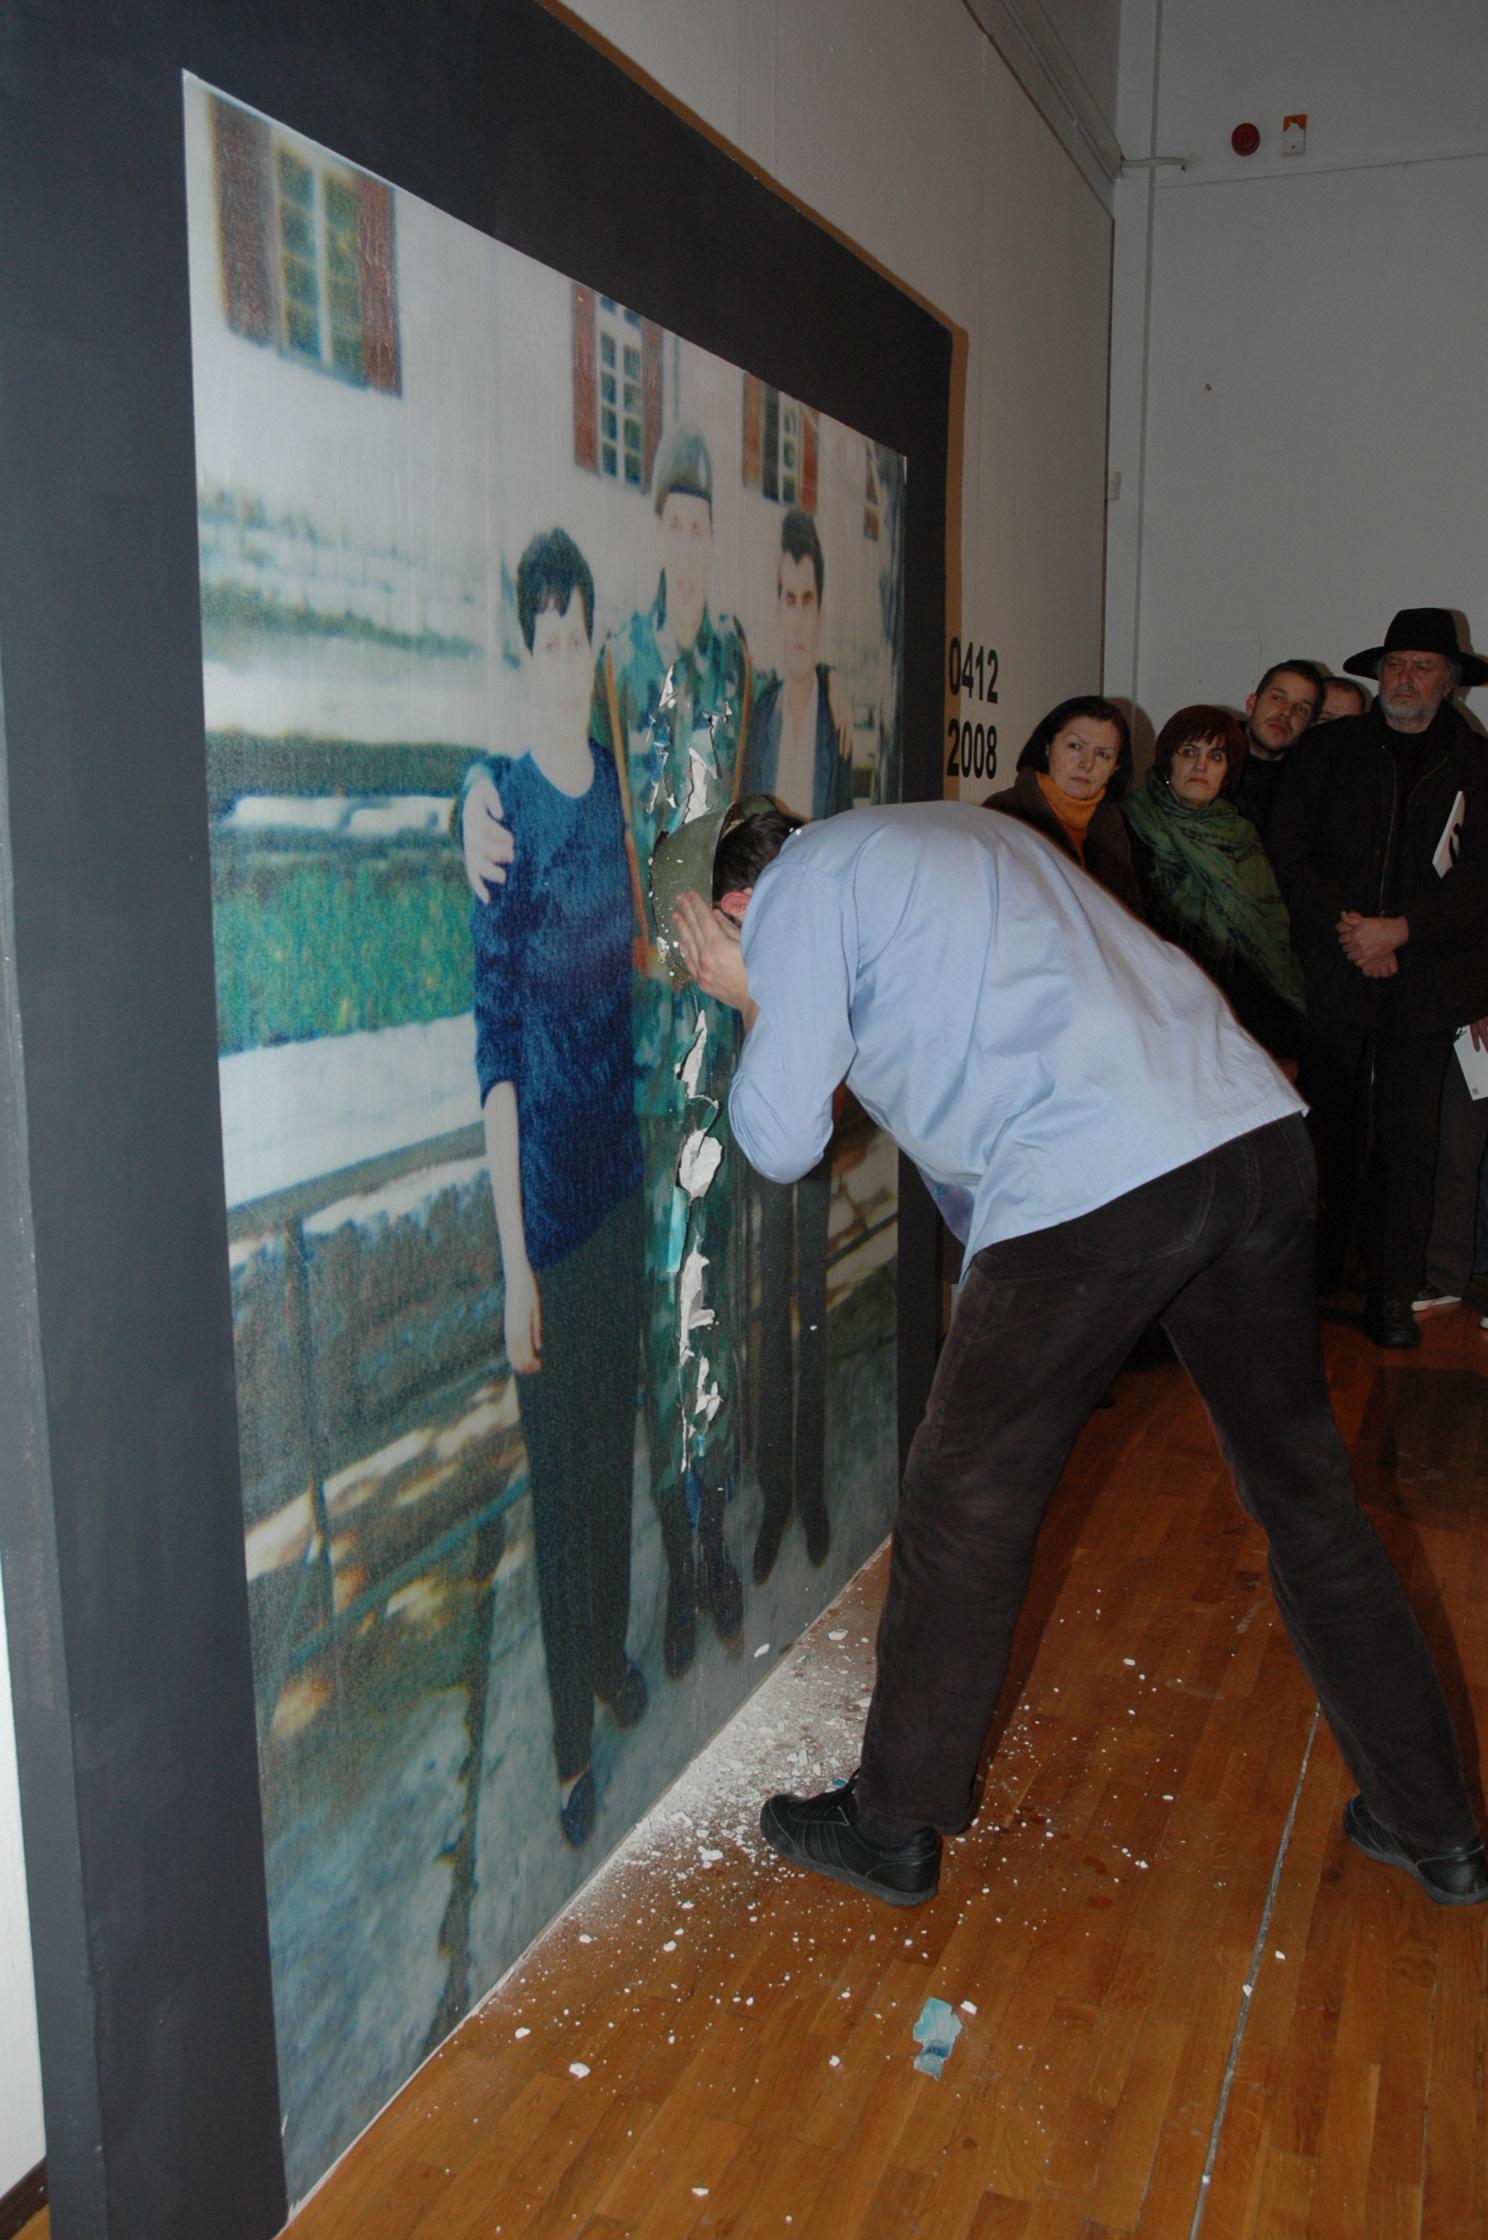 Show > 2007 > Graz Winner Show, Graz Austria 2007-03-10